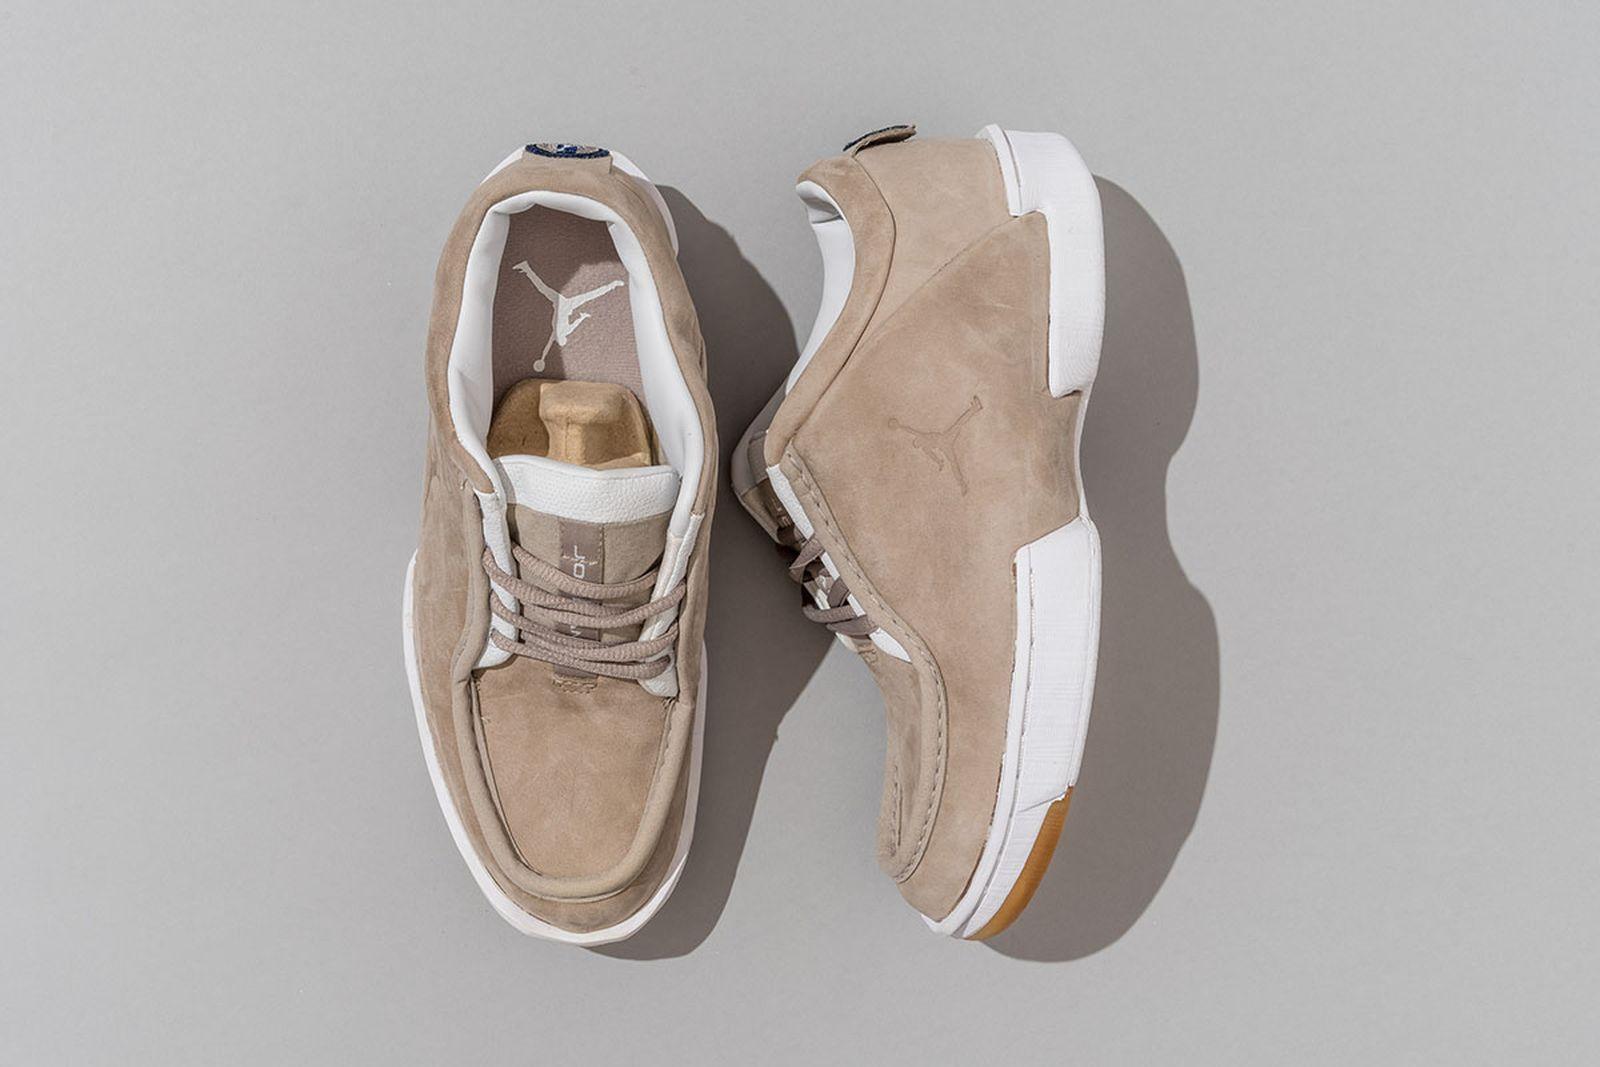 brad-hogan-jordan-sneaker-collection-07_0007_Background